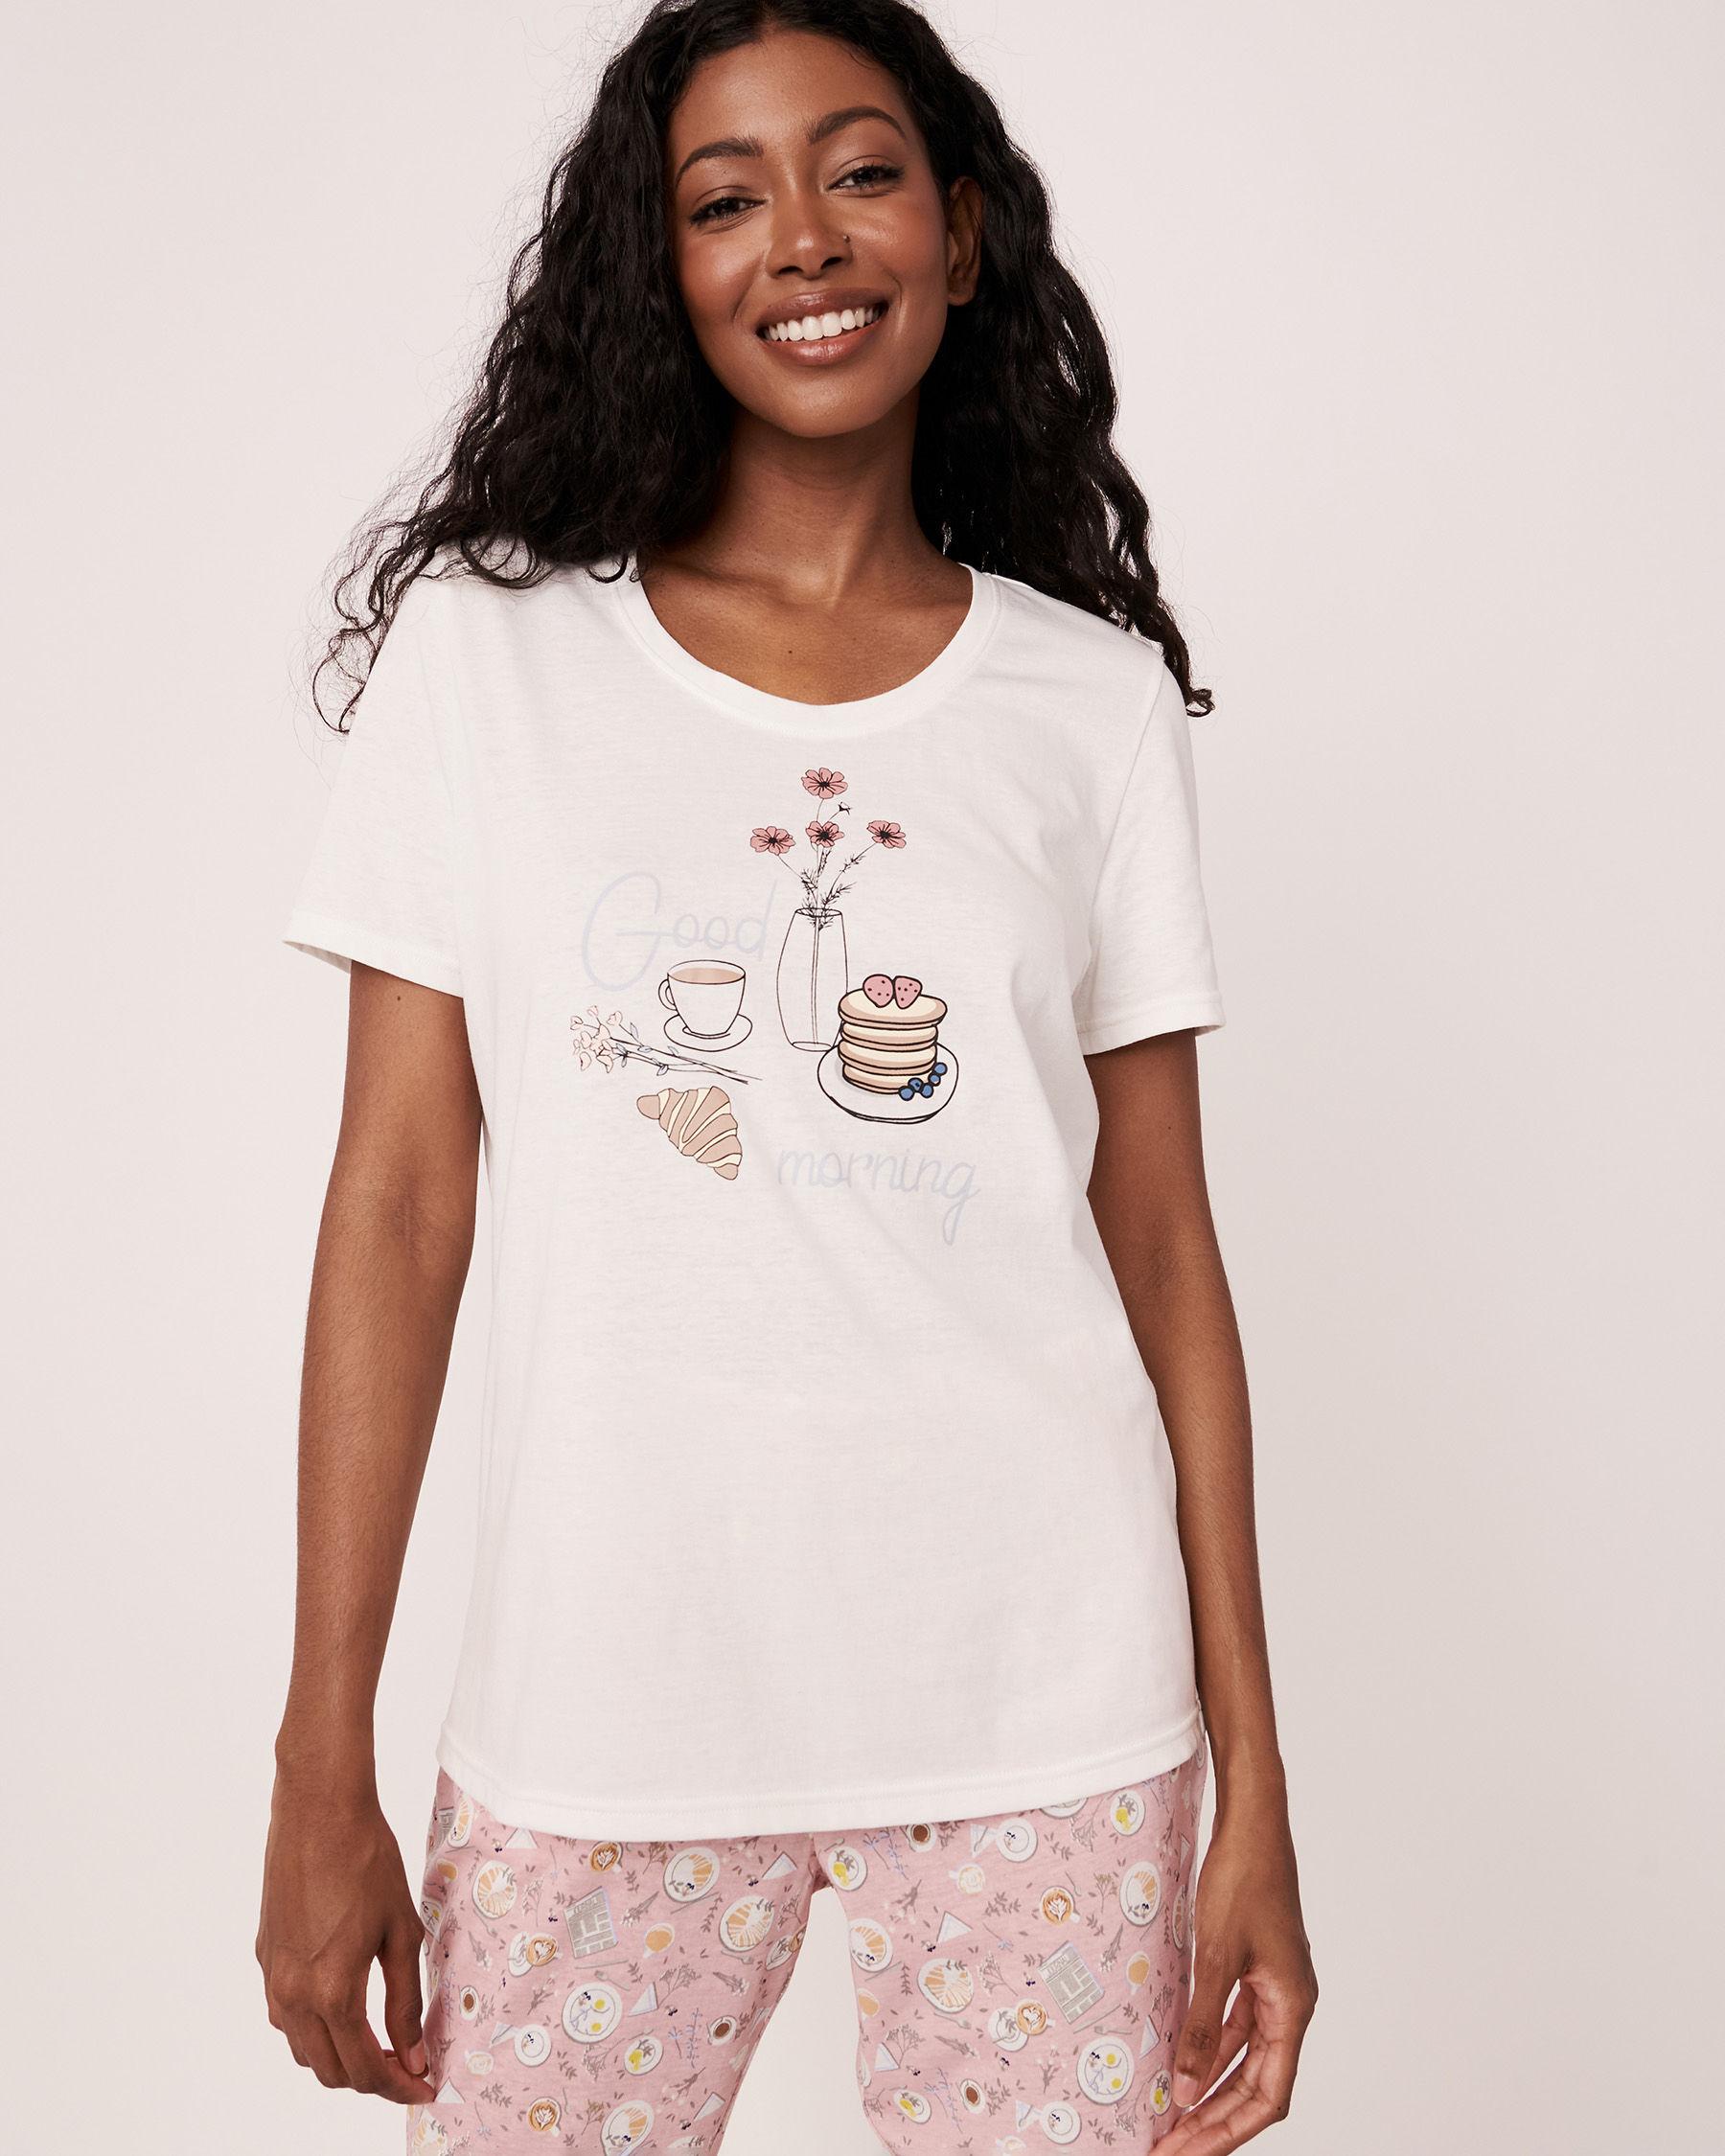 LA VIE EN ROSE Scoop Neckline T-shirt White 40100104 - View2